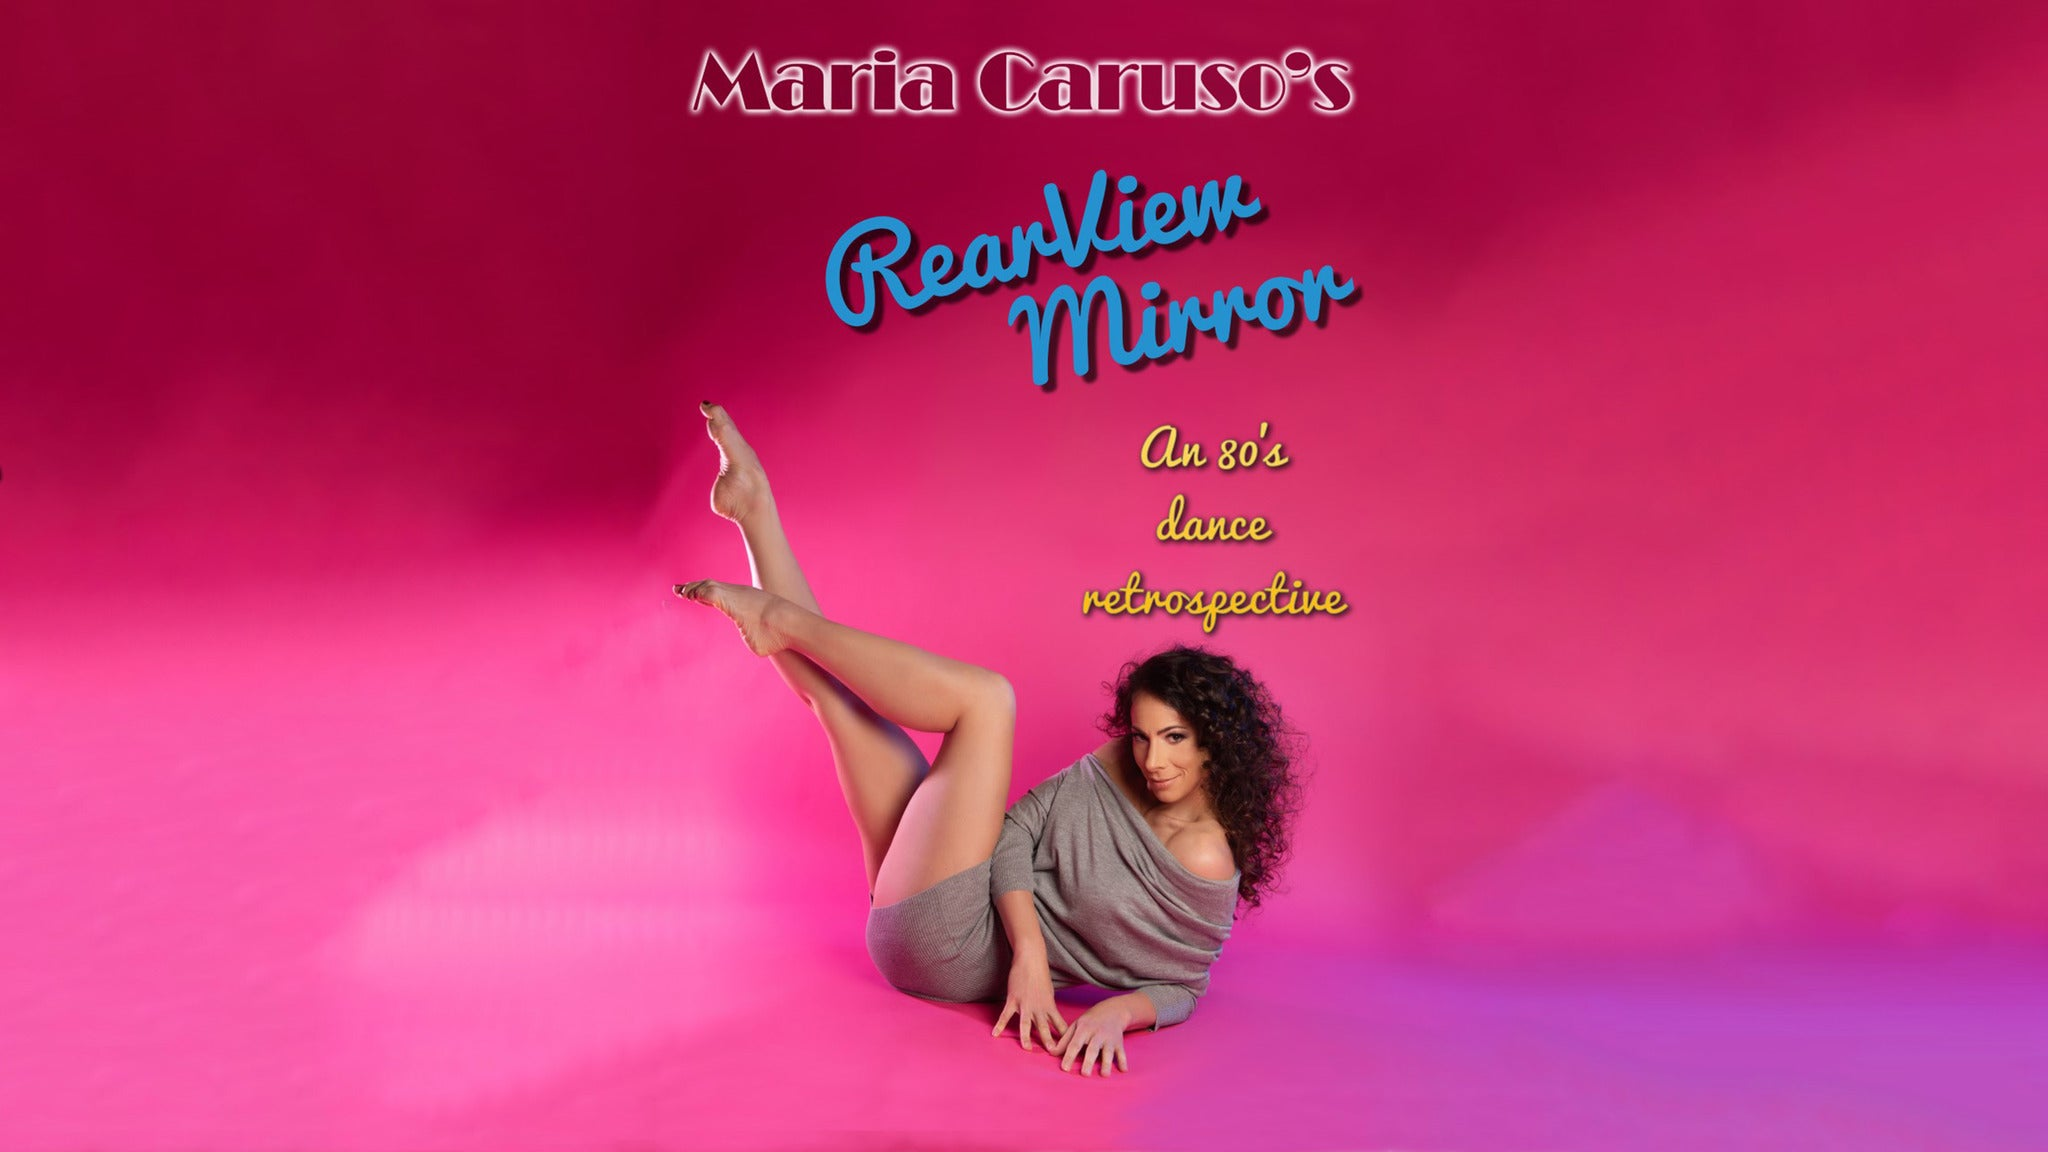 Maria Caruso's Rearview Mirror